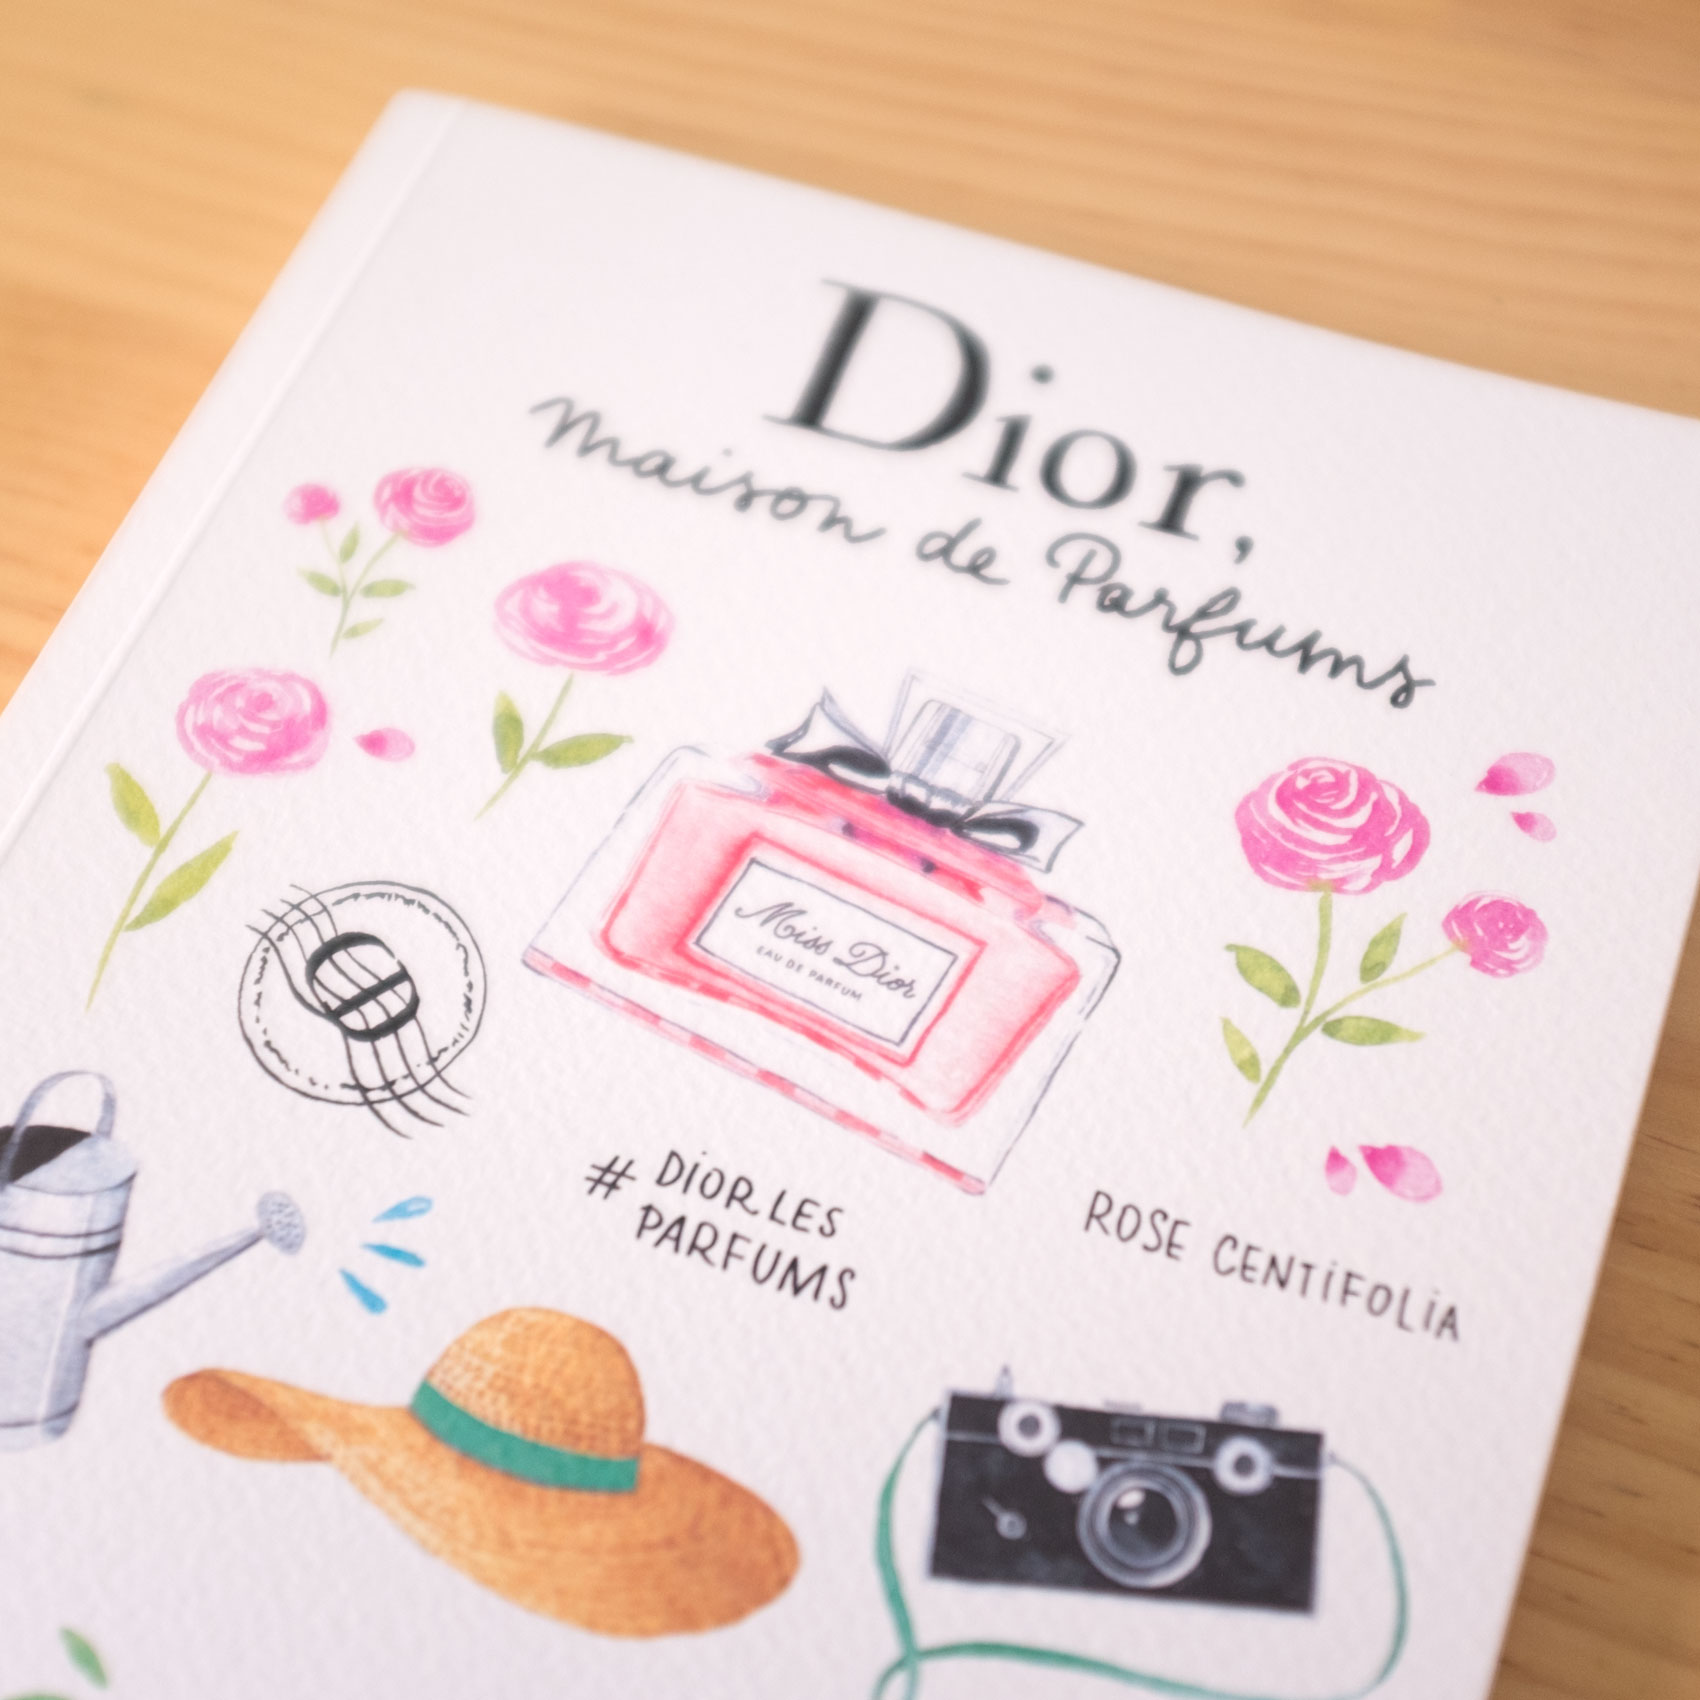 dior-04.jpg